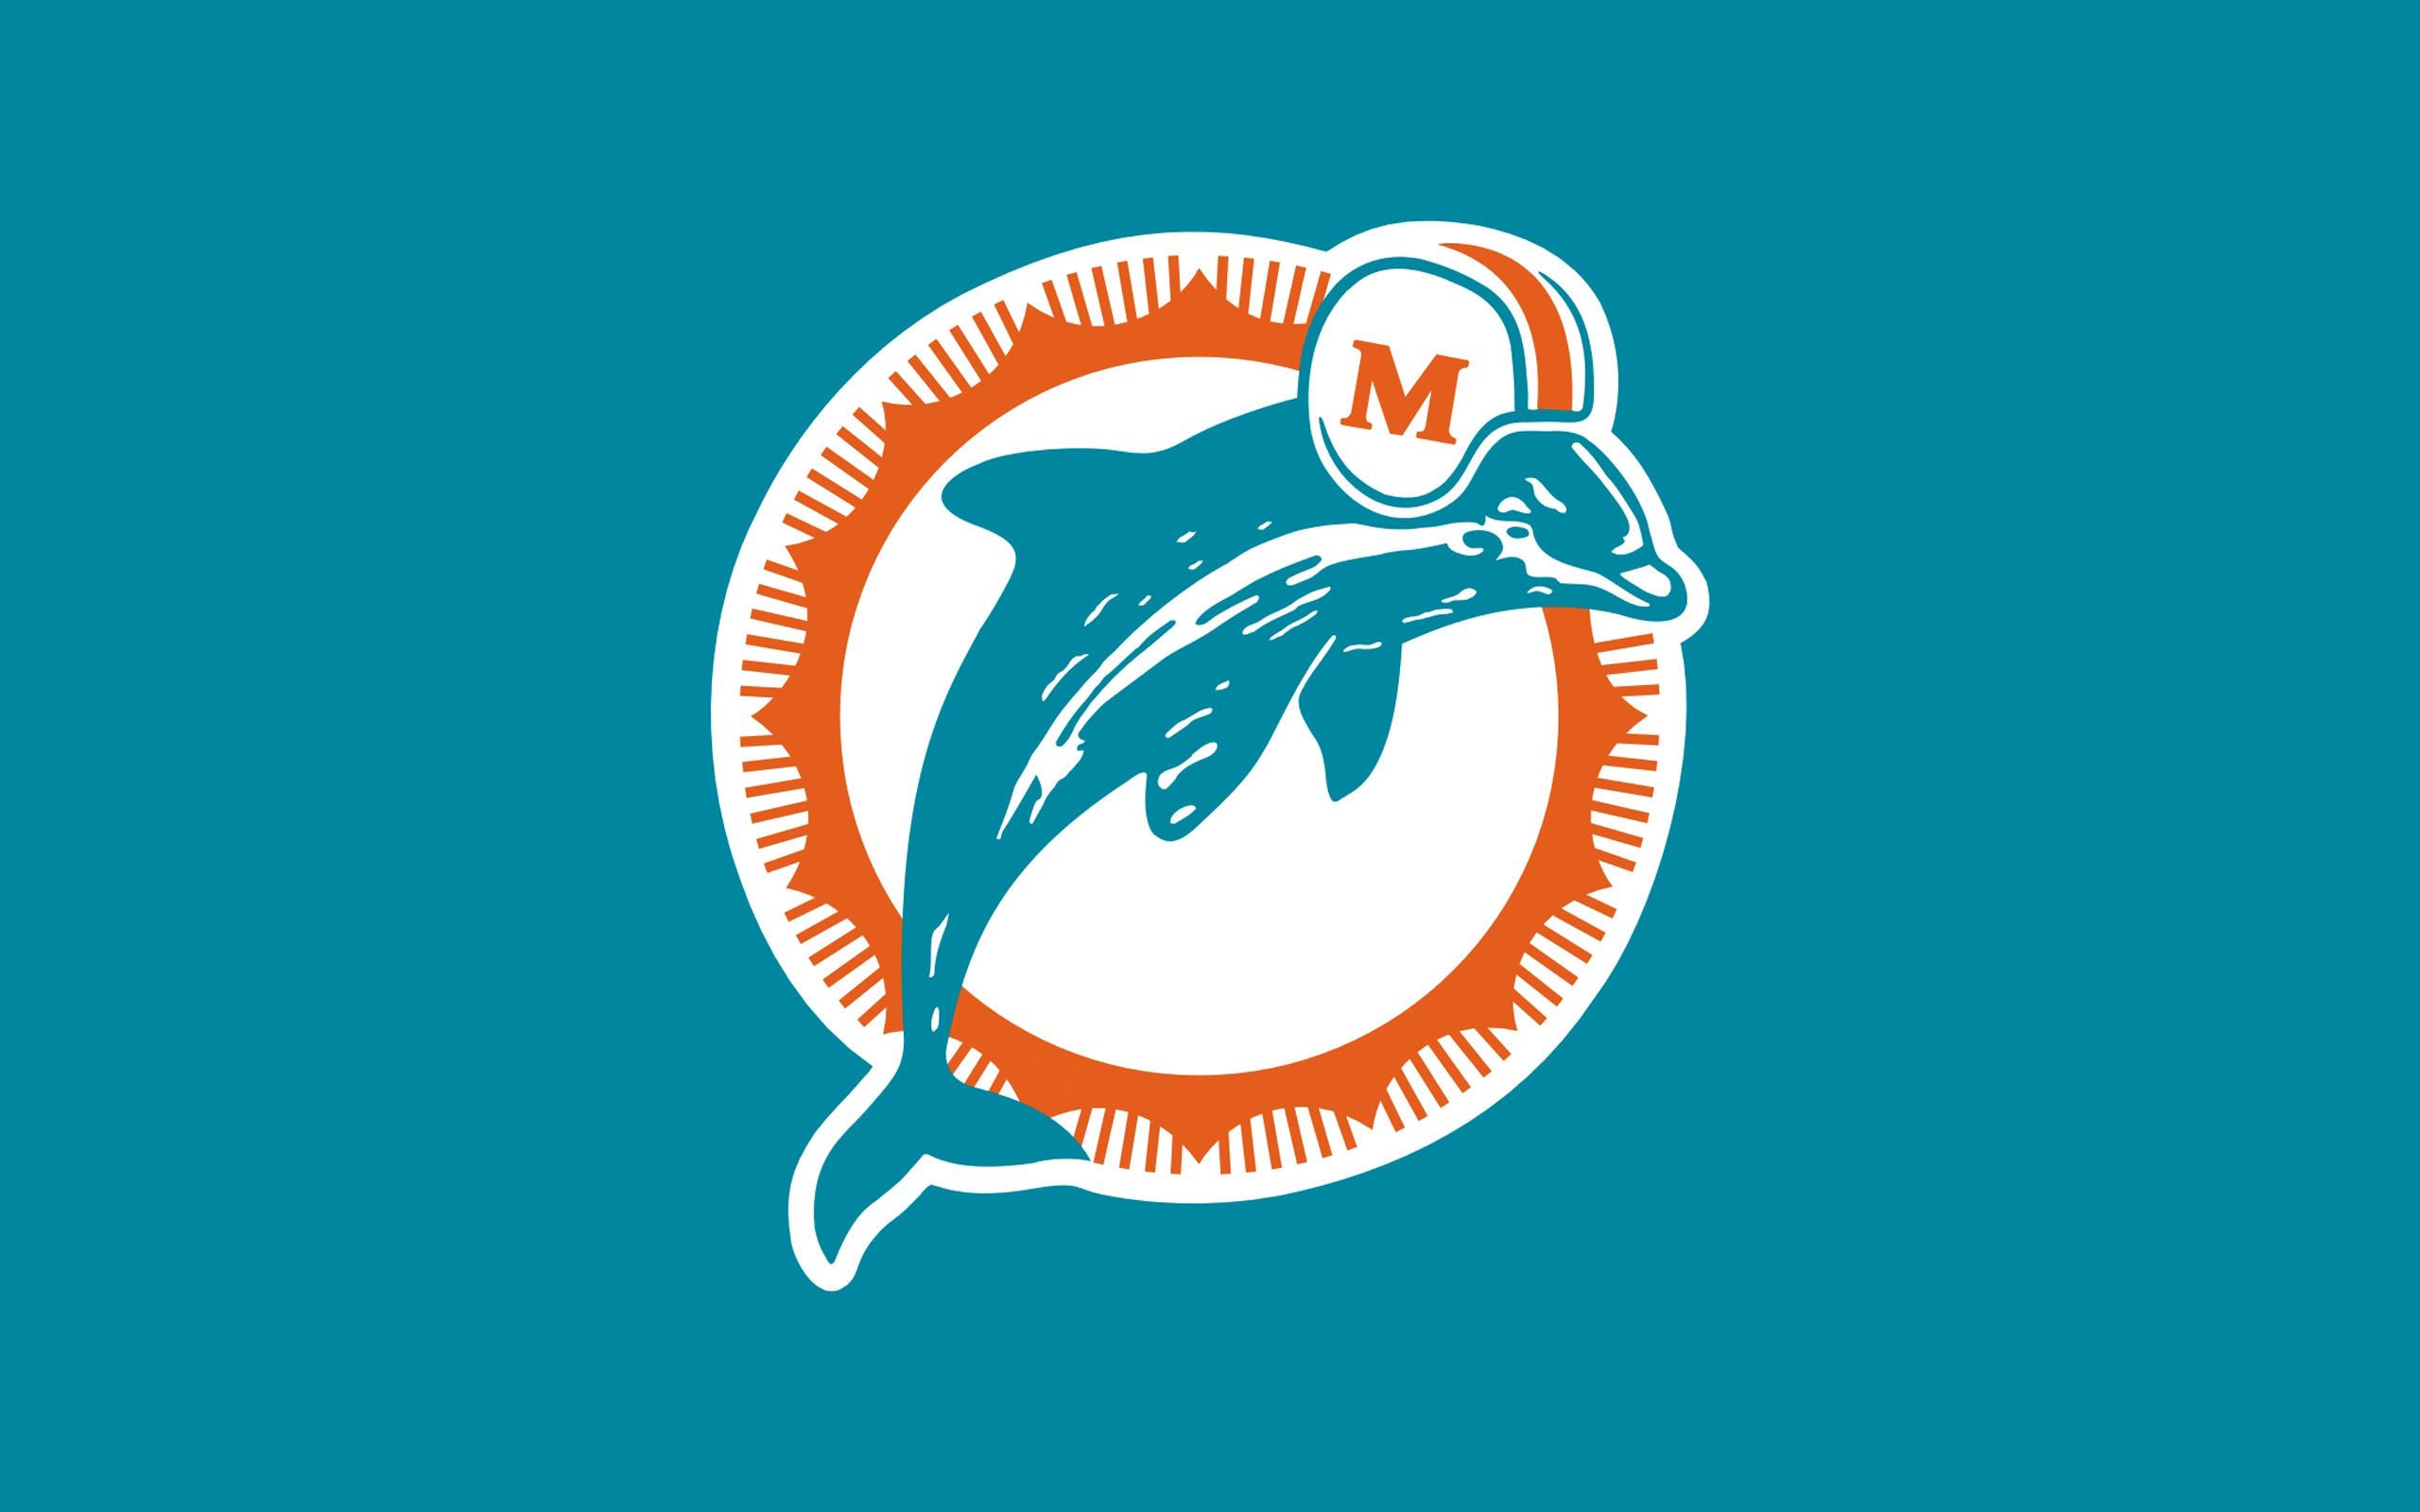 Miami Dolphins Wallpaper 14702